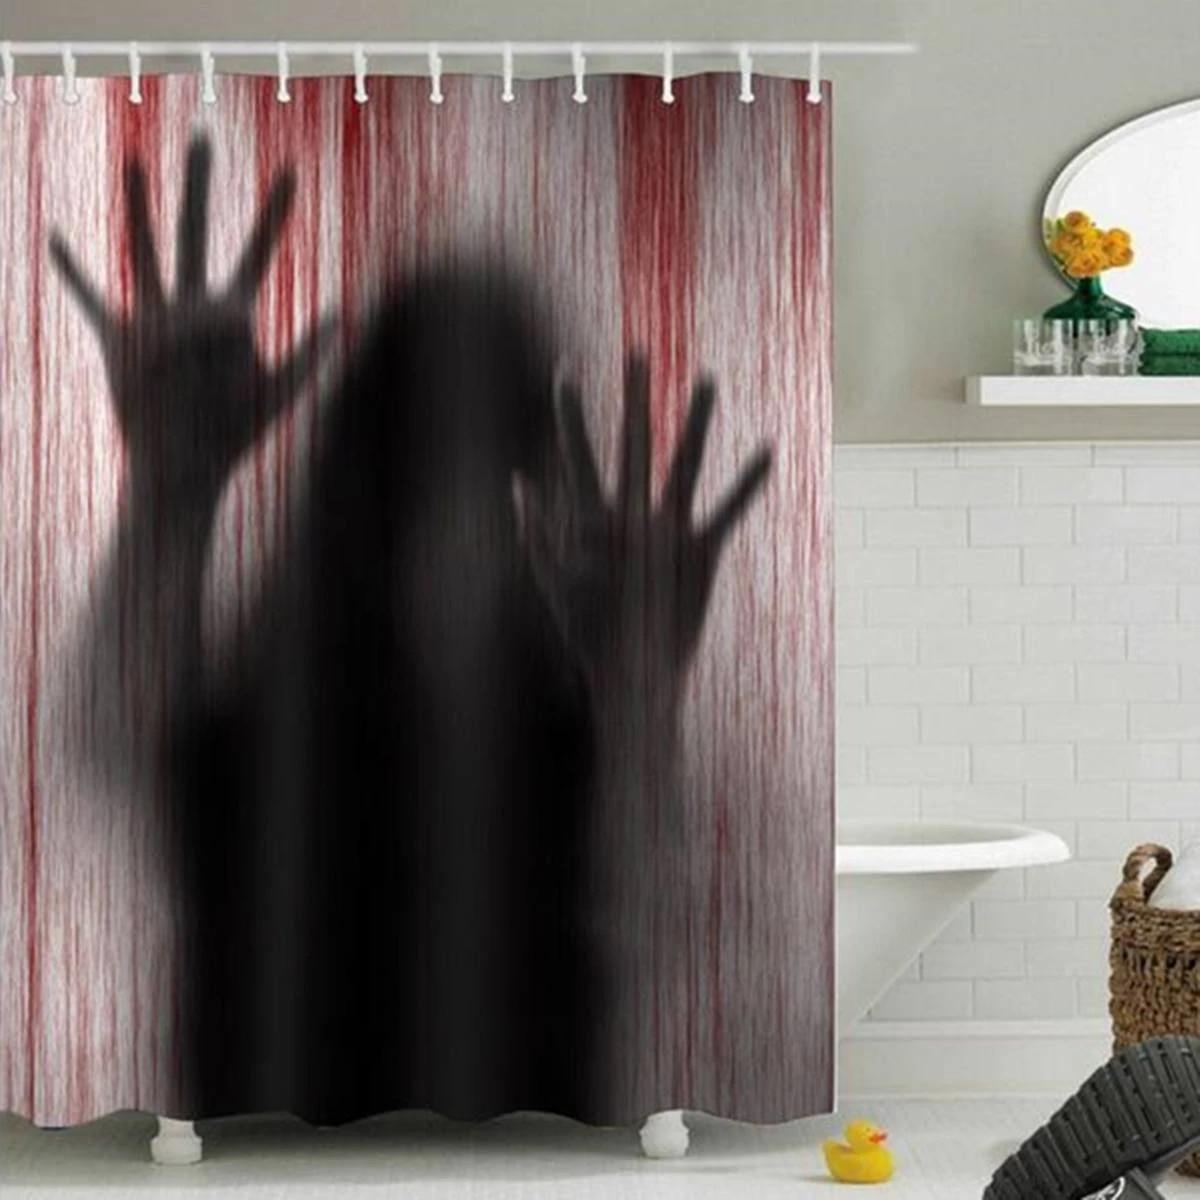 shower curtain halloween horror psycho bloody hands bathroom bath shower curtains decor gift waterproof polyester bathroom curta